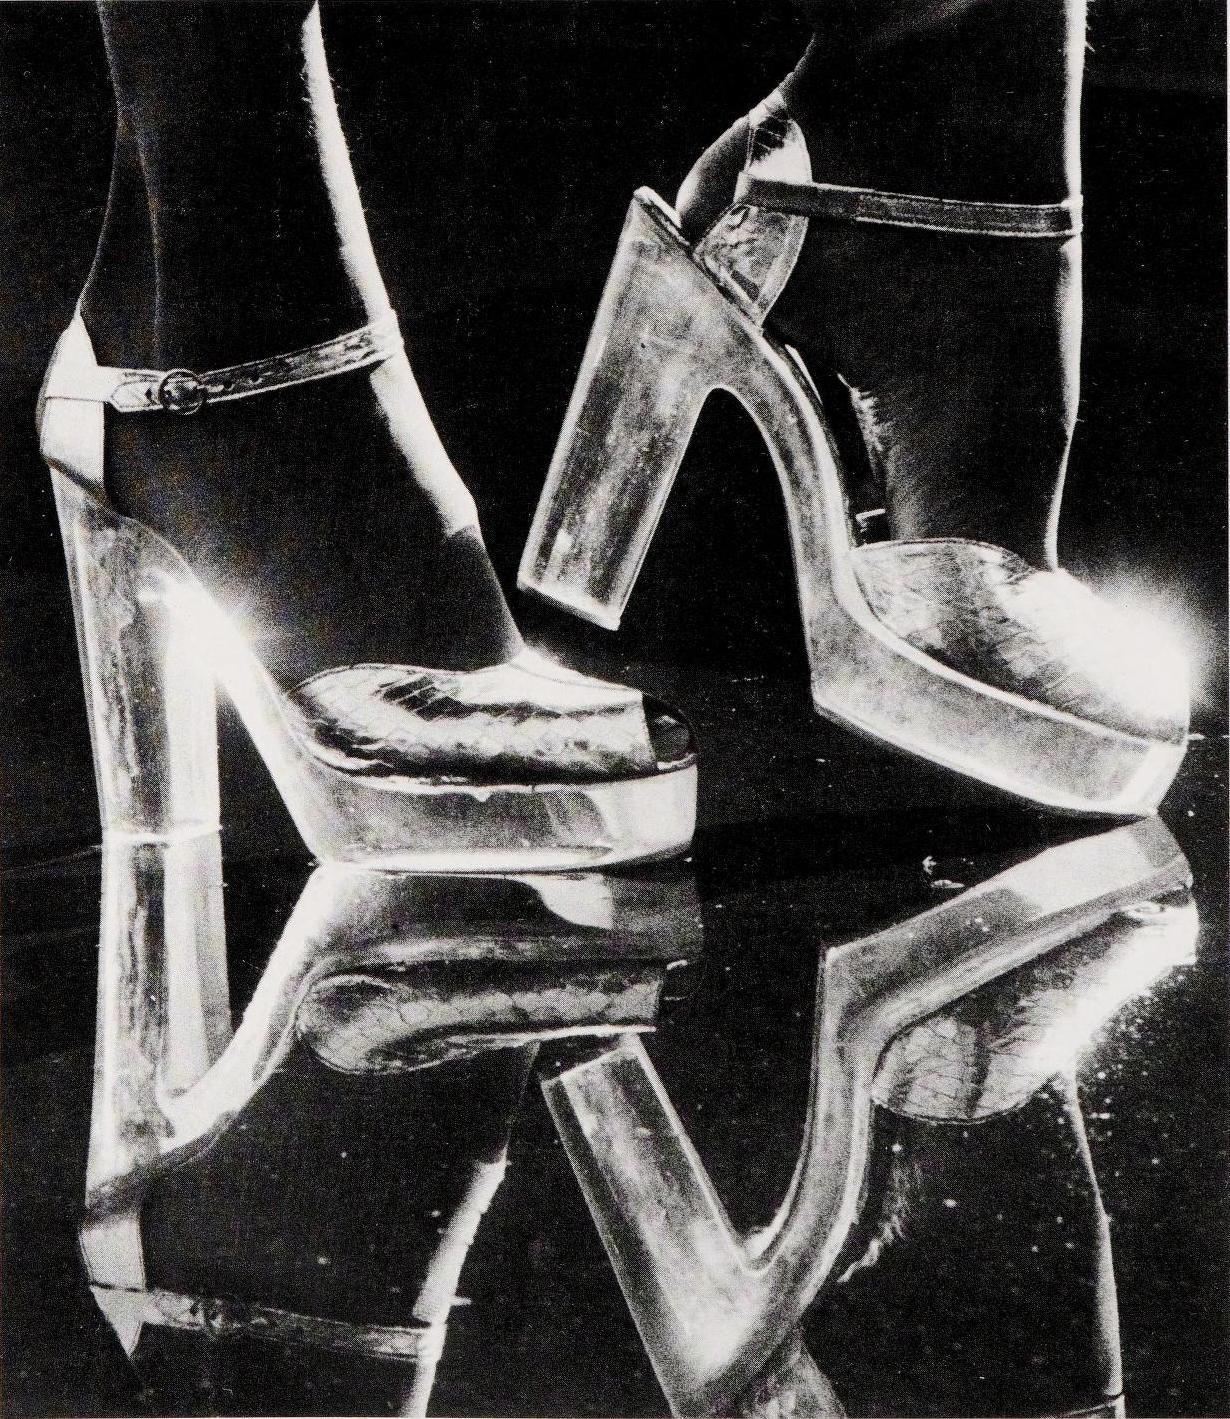 70′s Perspex High Heel Shoes